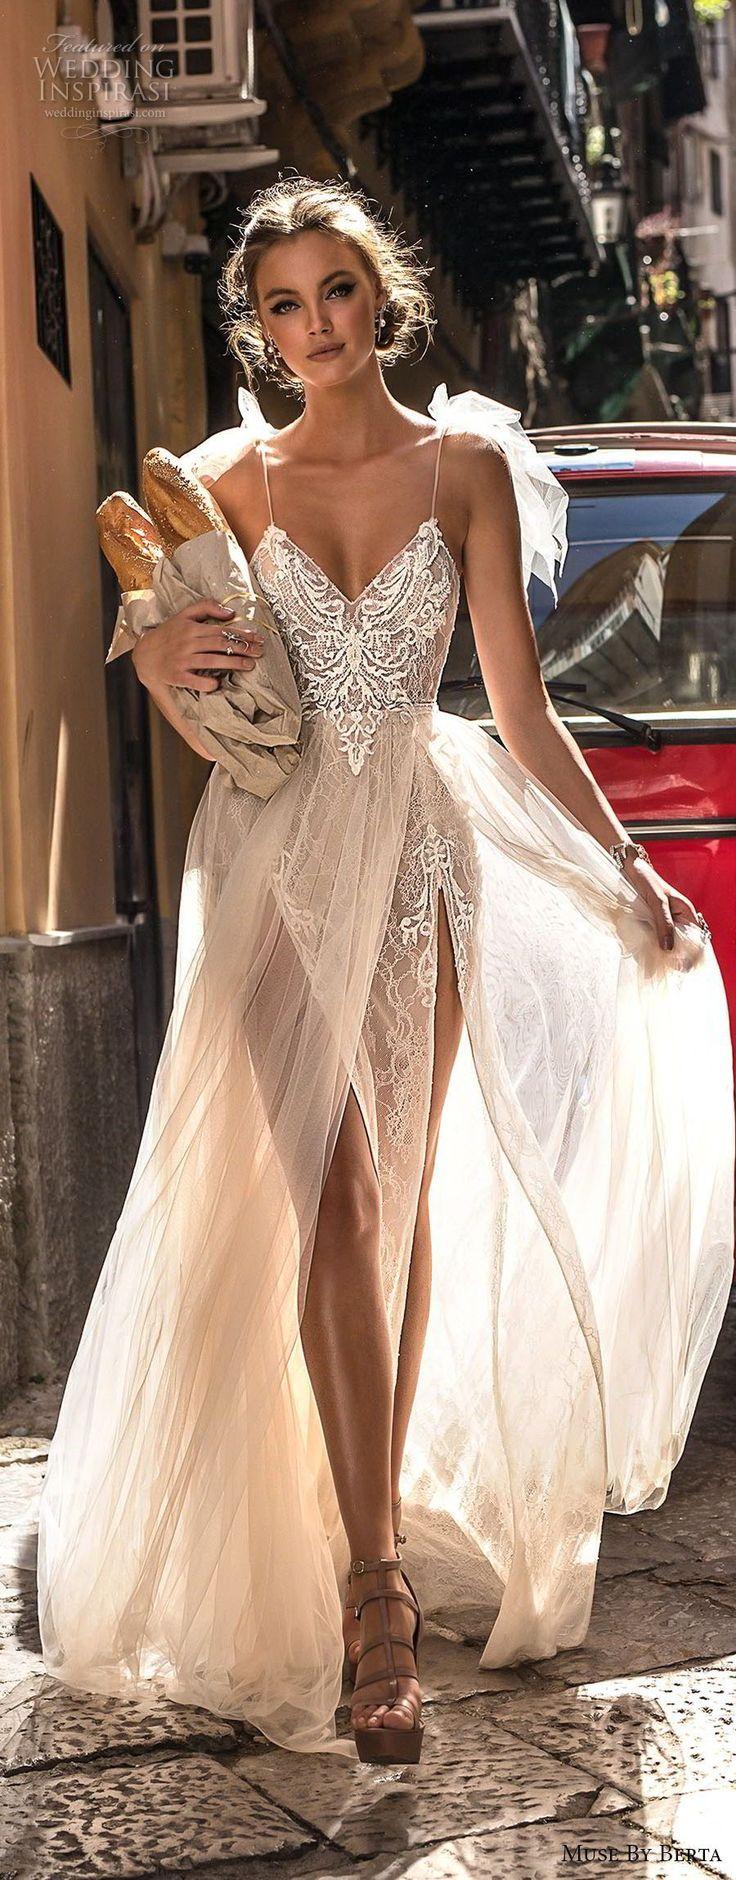 muse berta 2018 bridal spaghetti strap sweetheart neckline heavily embellished bodice high slit tulle skirt sexy soft a line wedding dress sweep train (1) lv -- Muse by Berta 2018 Wedding Dresses